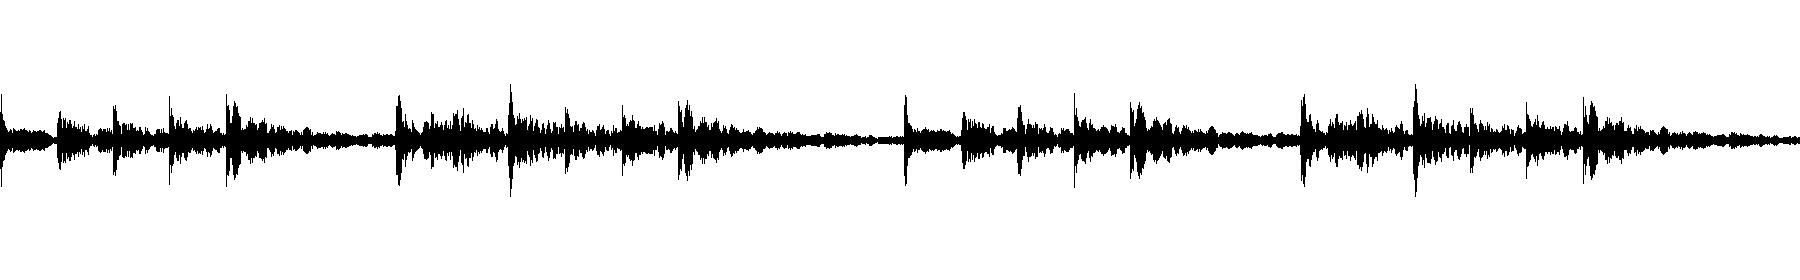 blbc cinedrumsb 75 01